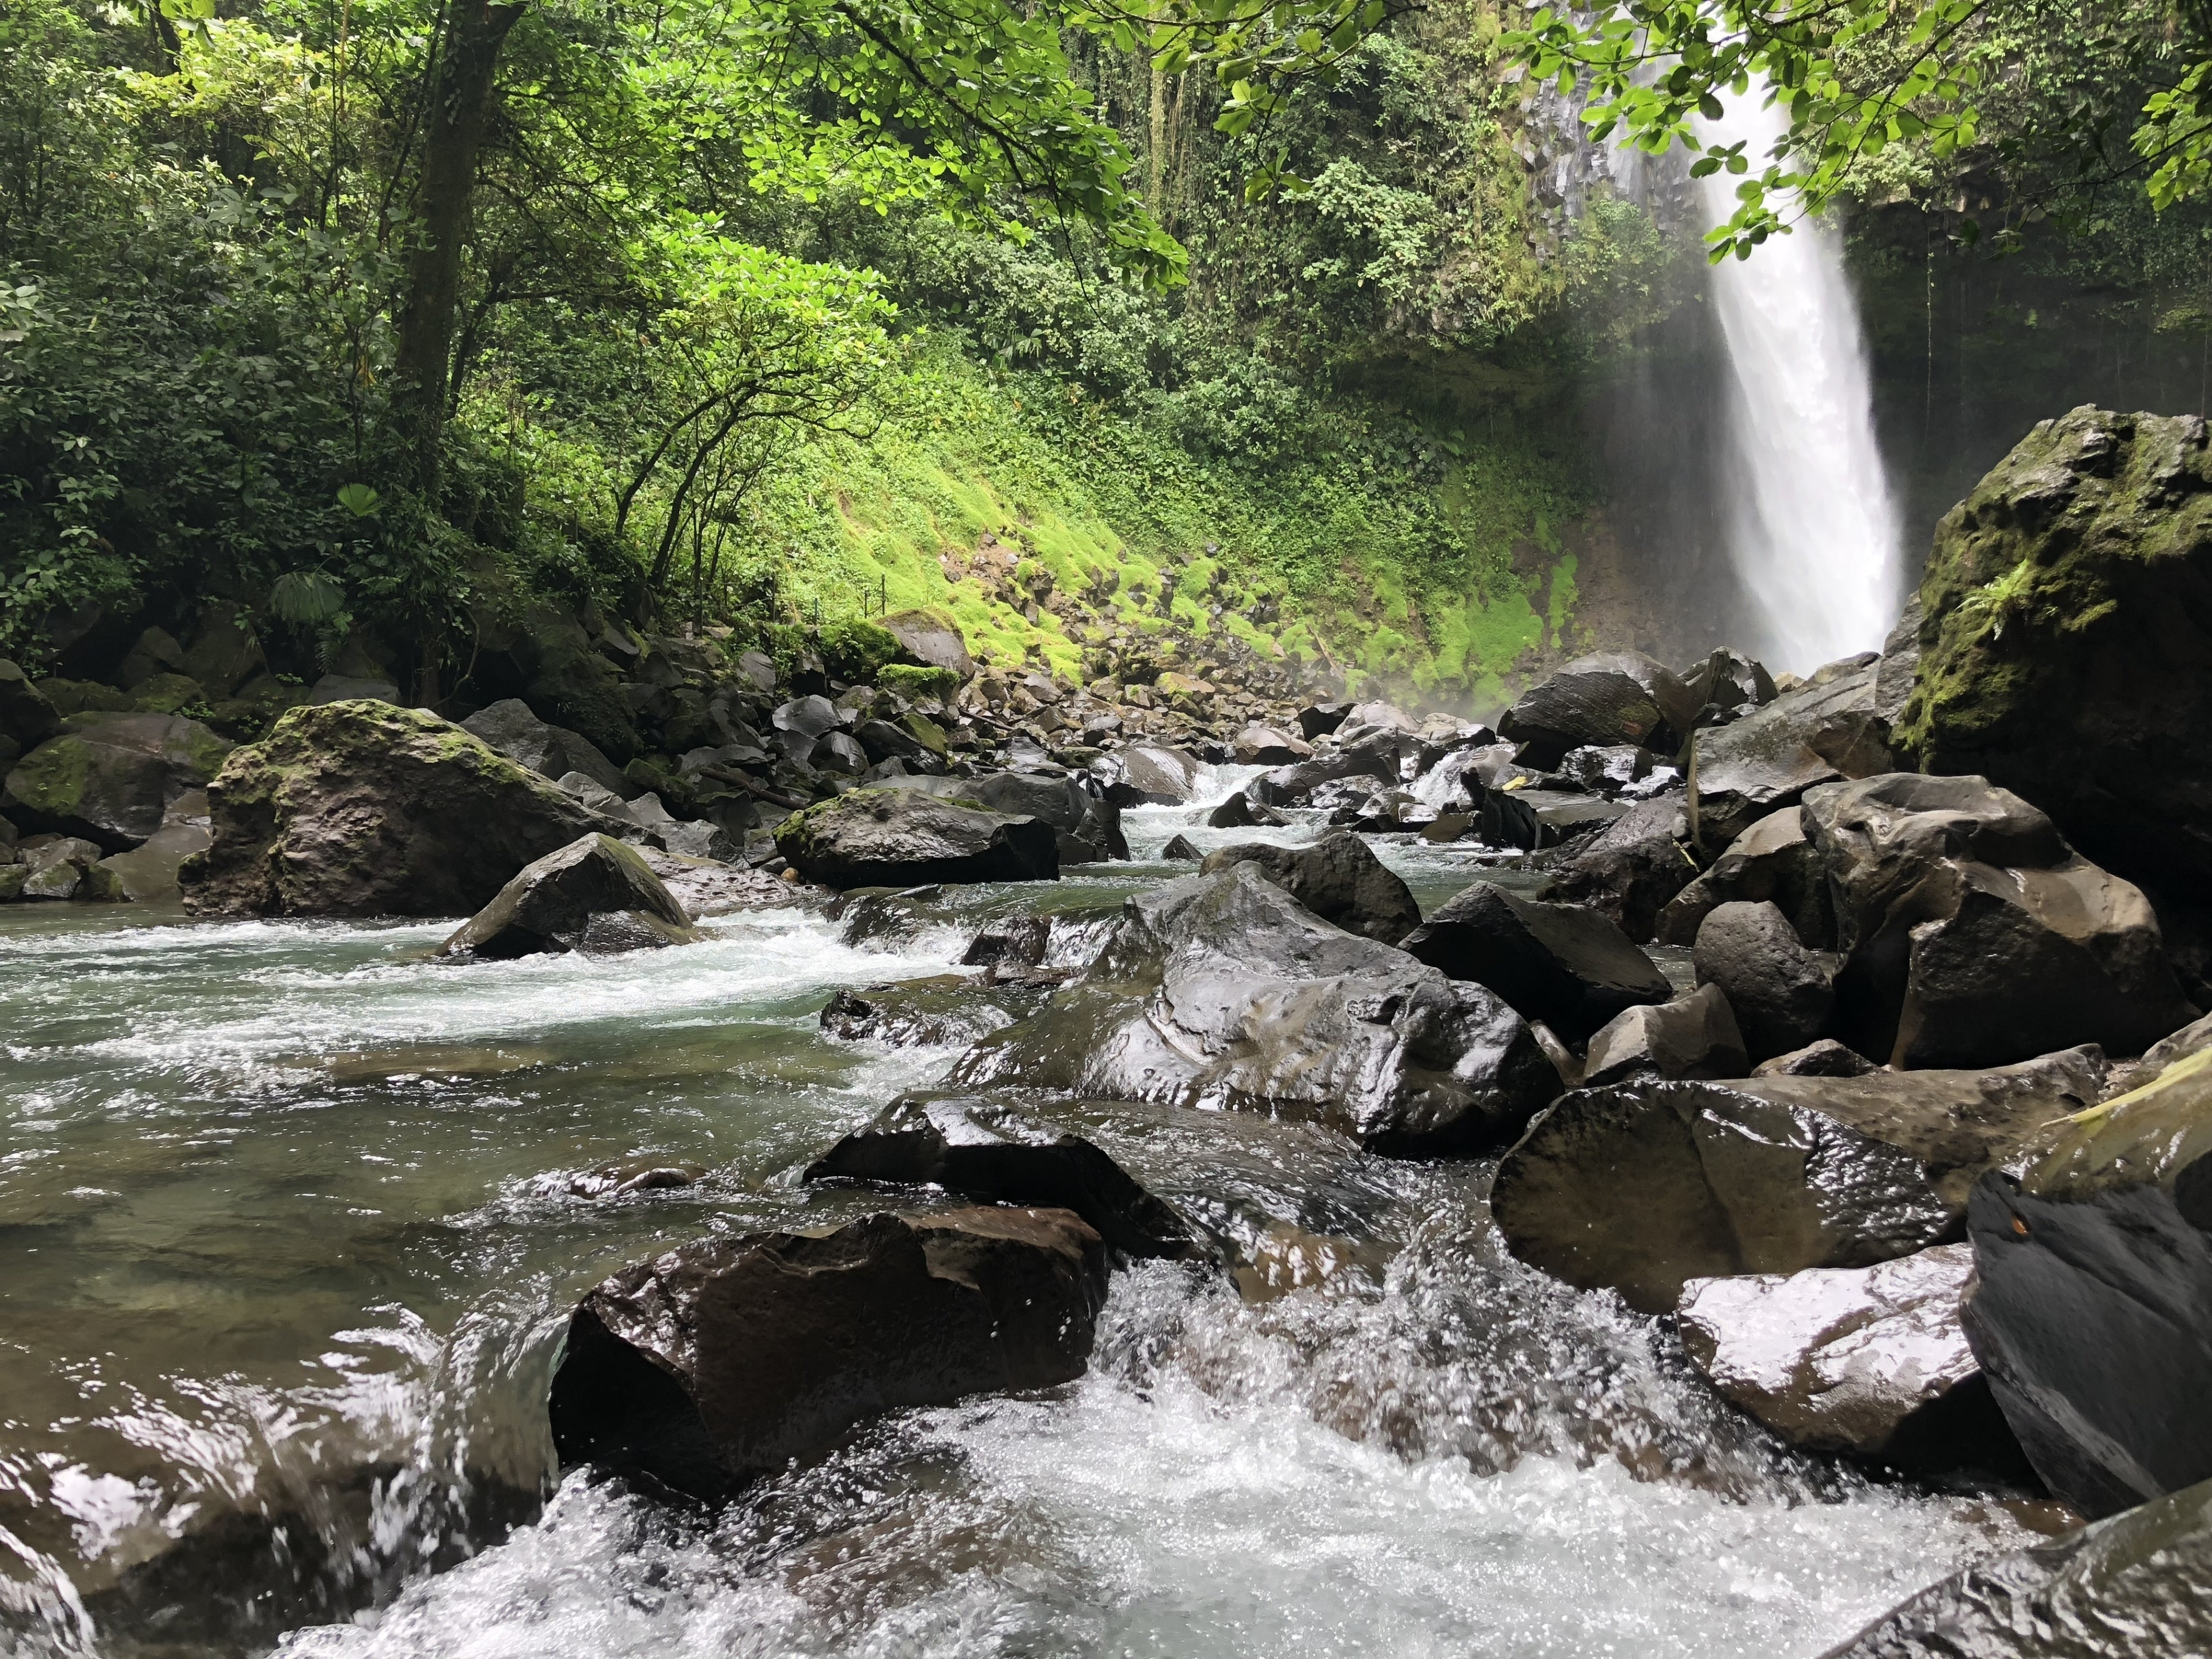 La Fortuna Waterfall, La Fortuna, Alajuela Province, Costa Rica